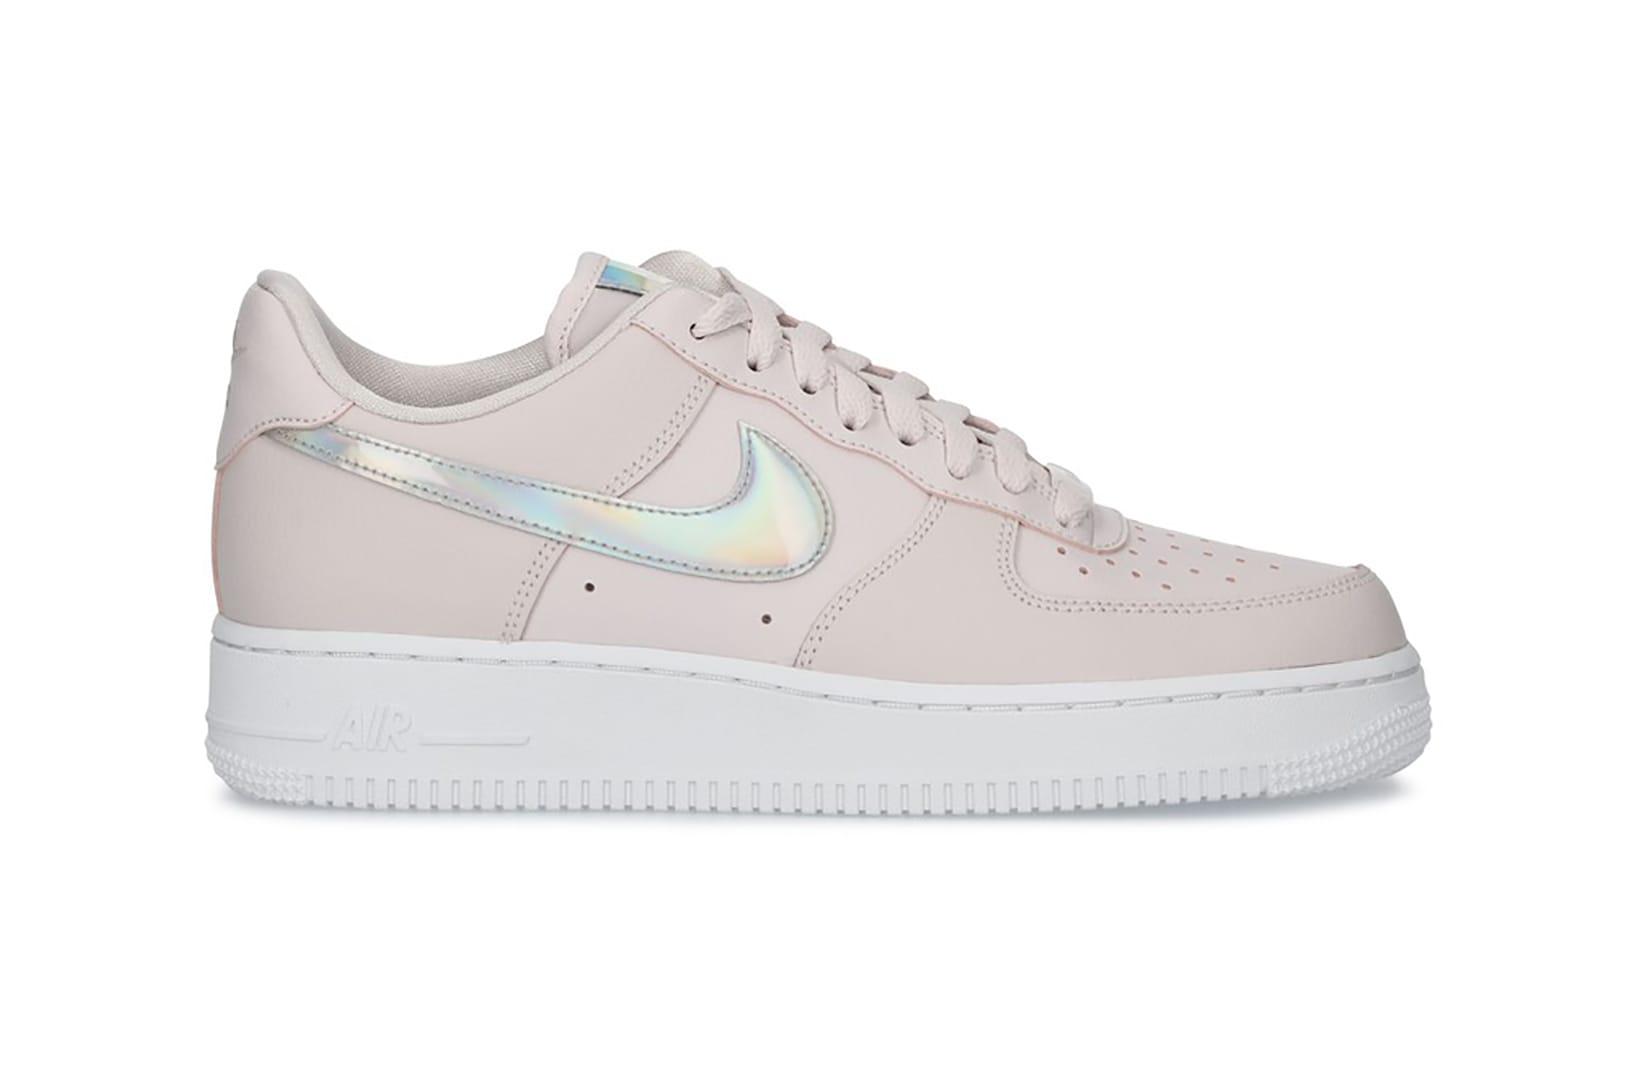 Nike Air Force 1 '07 Pastel Pink Silver